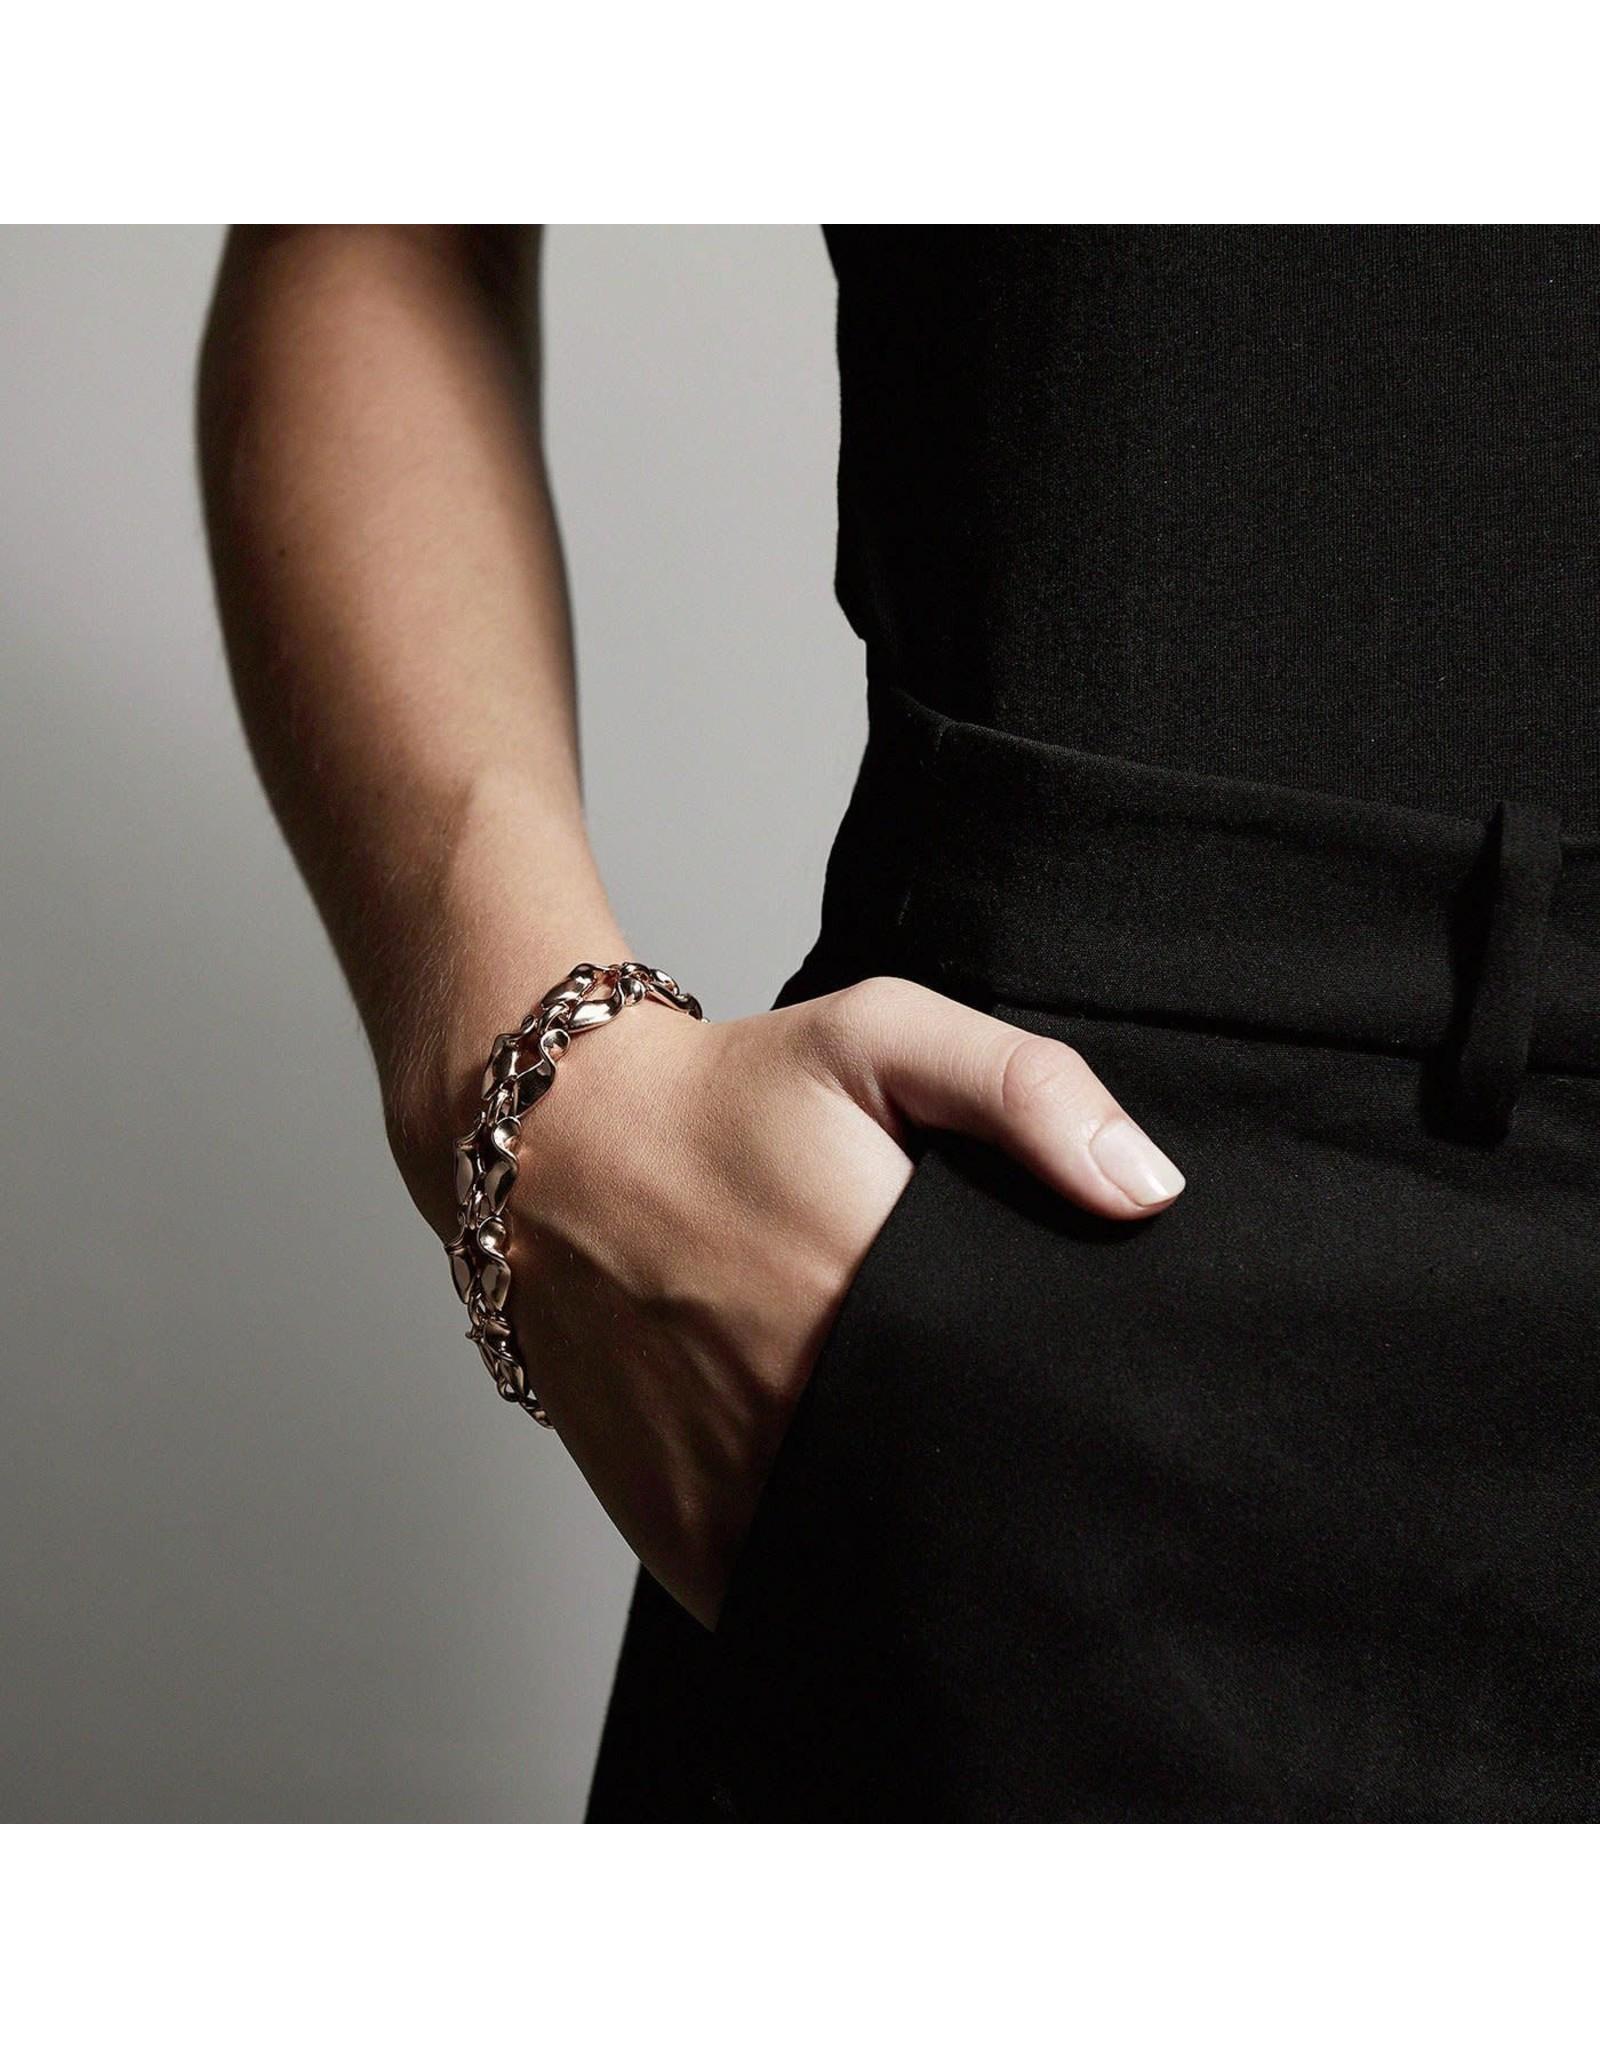 Pilgrim Pilgrim Hollis Bracelet Rose Gold Plated